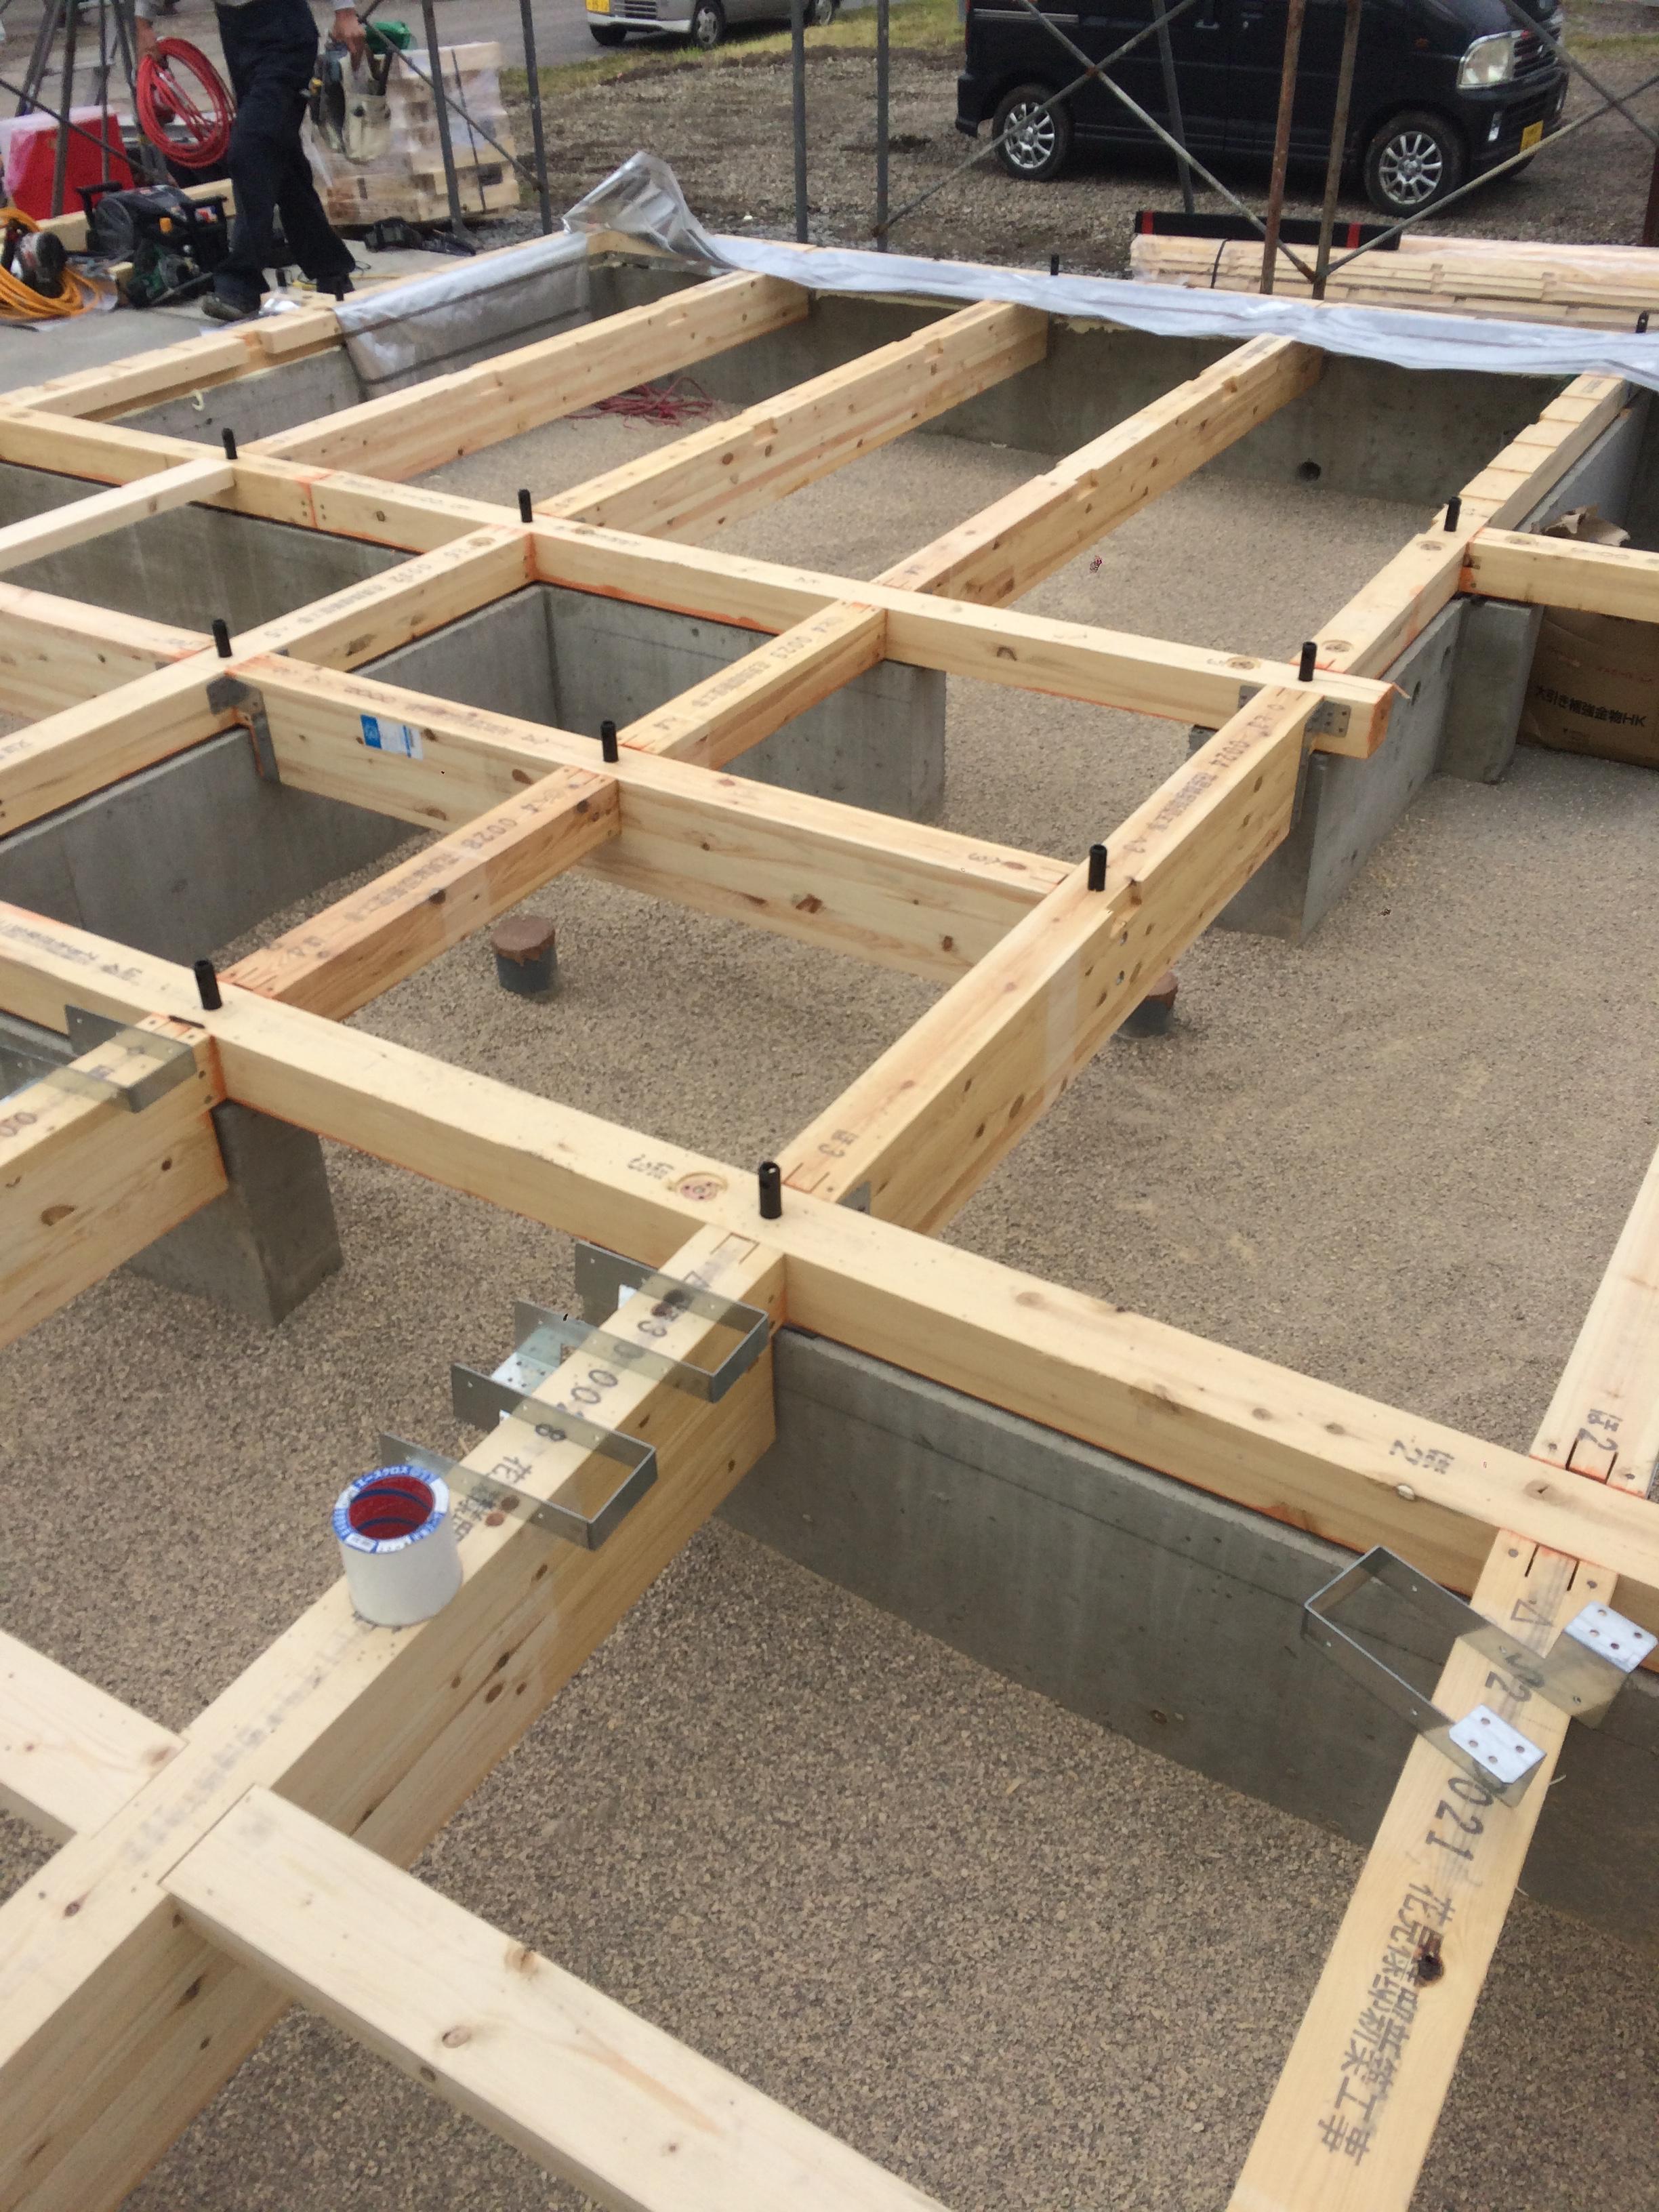 H様邸新築工事 ⑤土台敷・珪藻土敷き込み